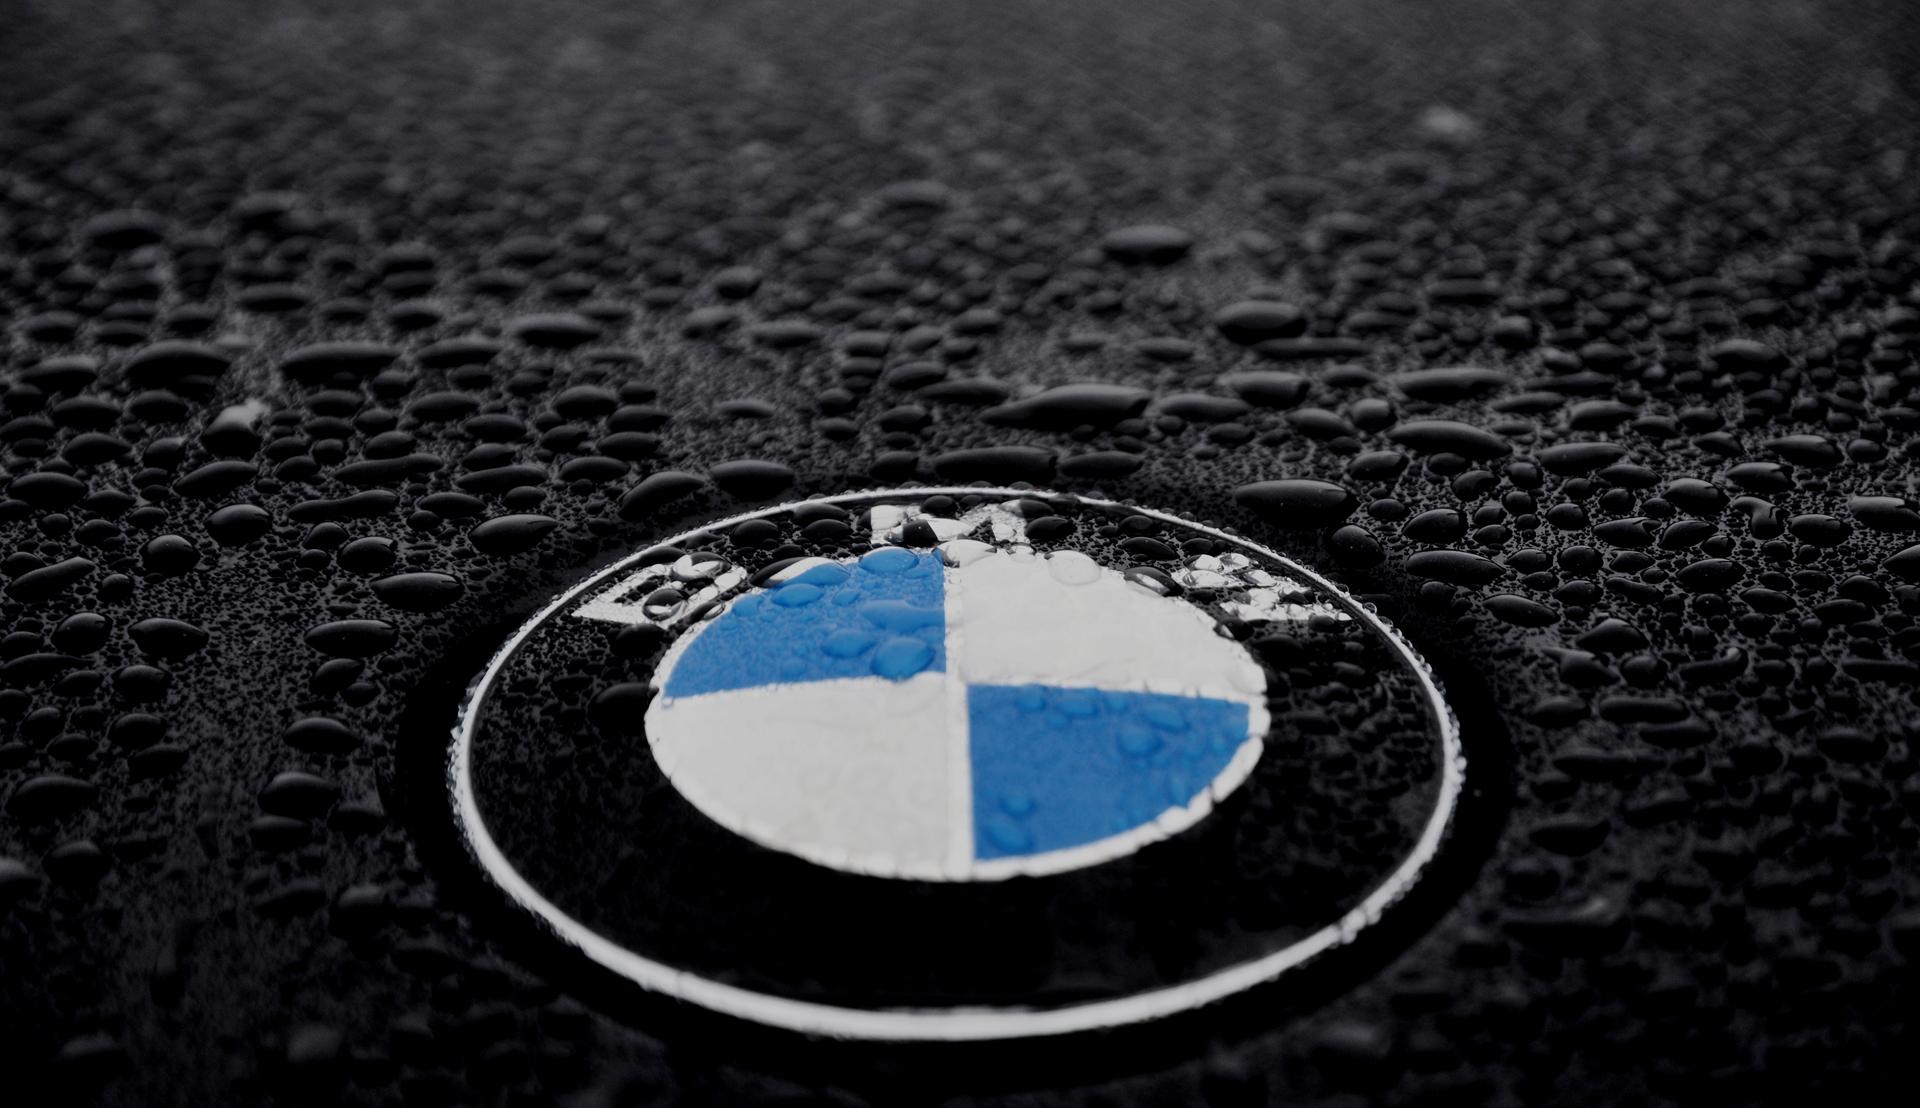 BMW Amazing logo Wallpaper HD HD Wallpapers 1920x1108